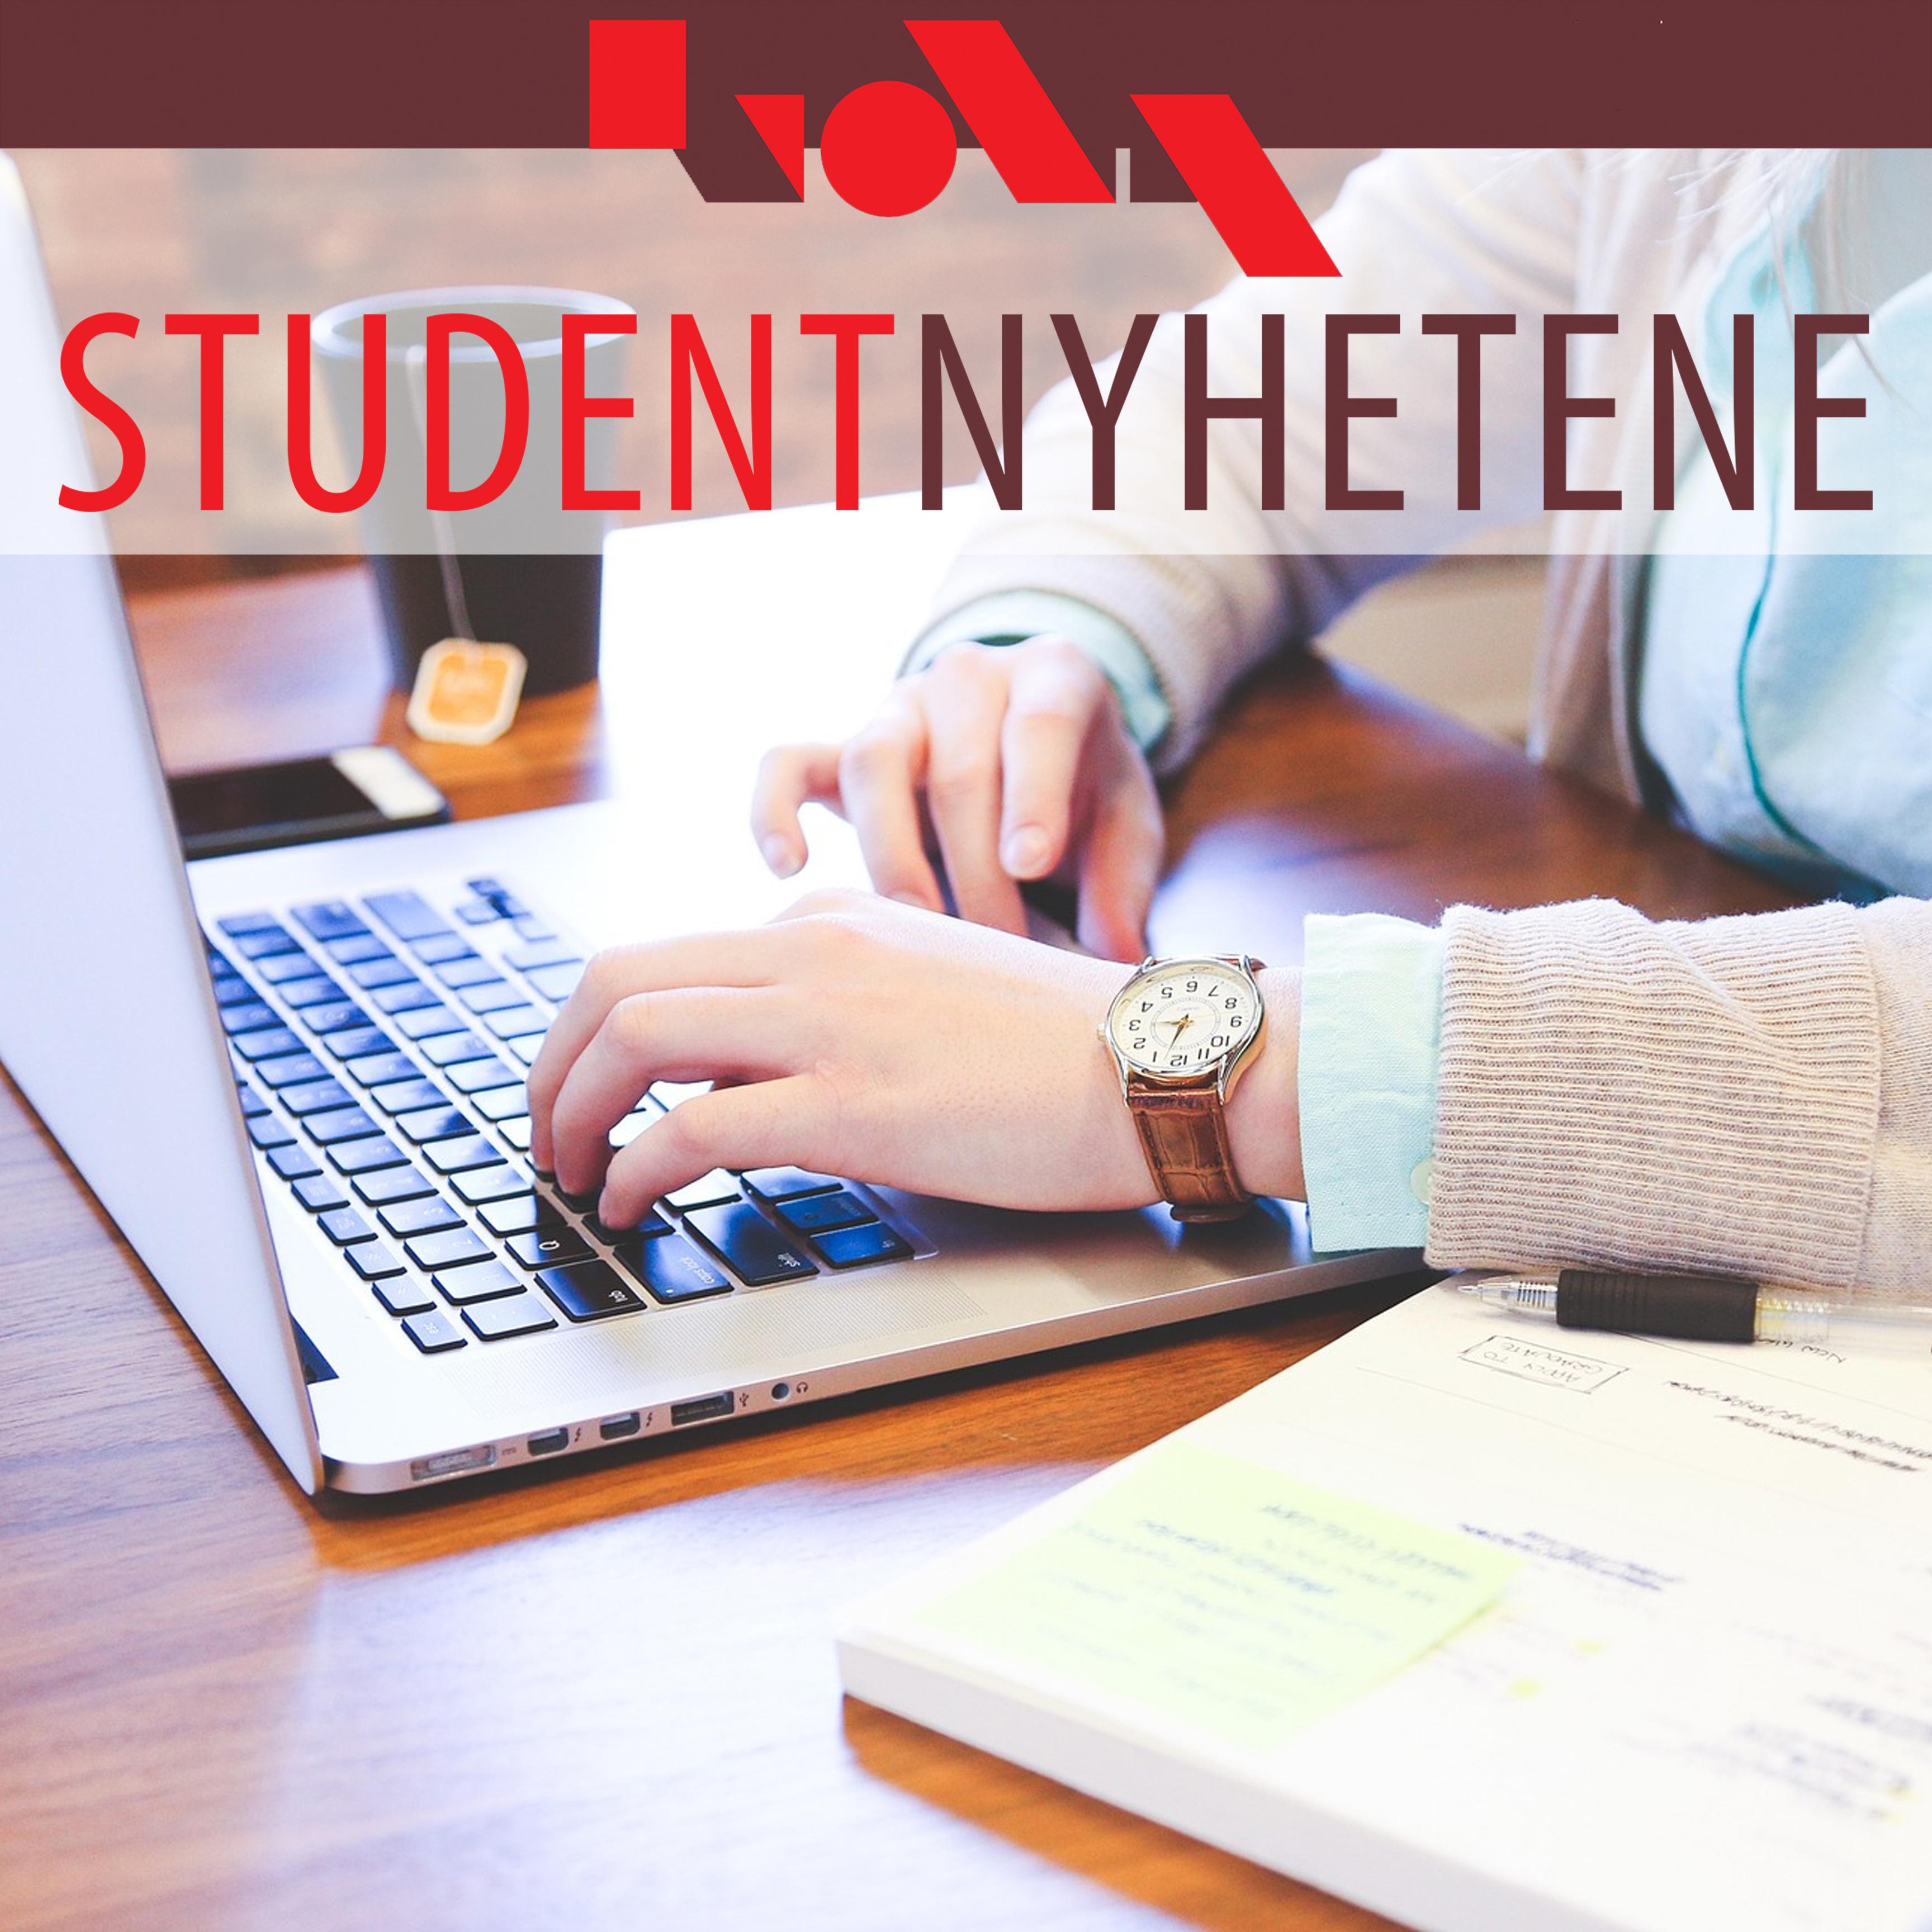 Studentnyhetene